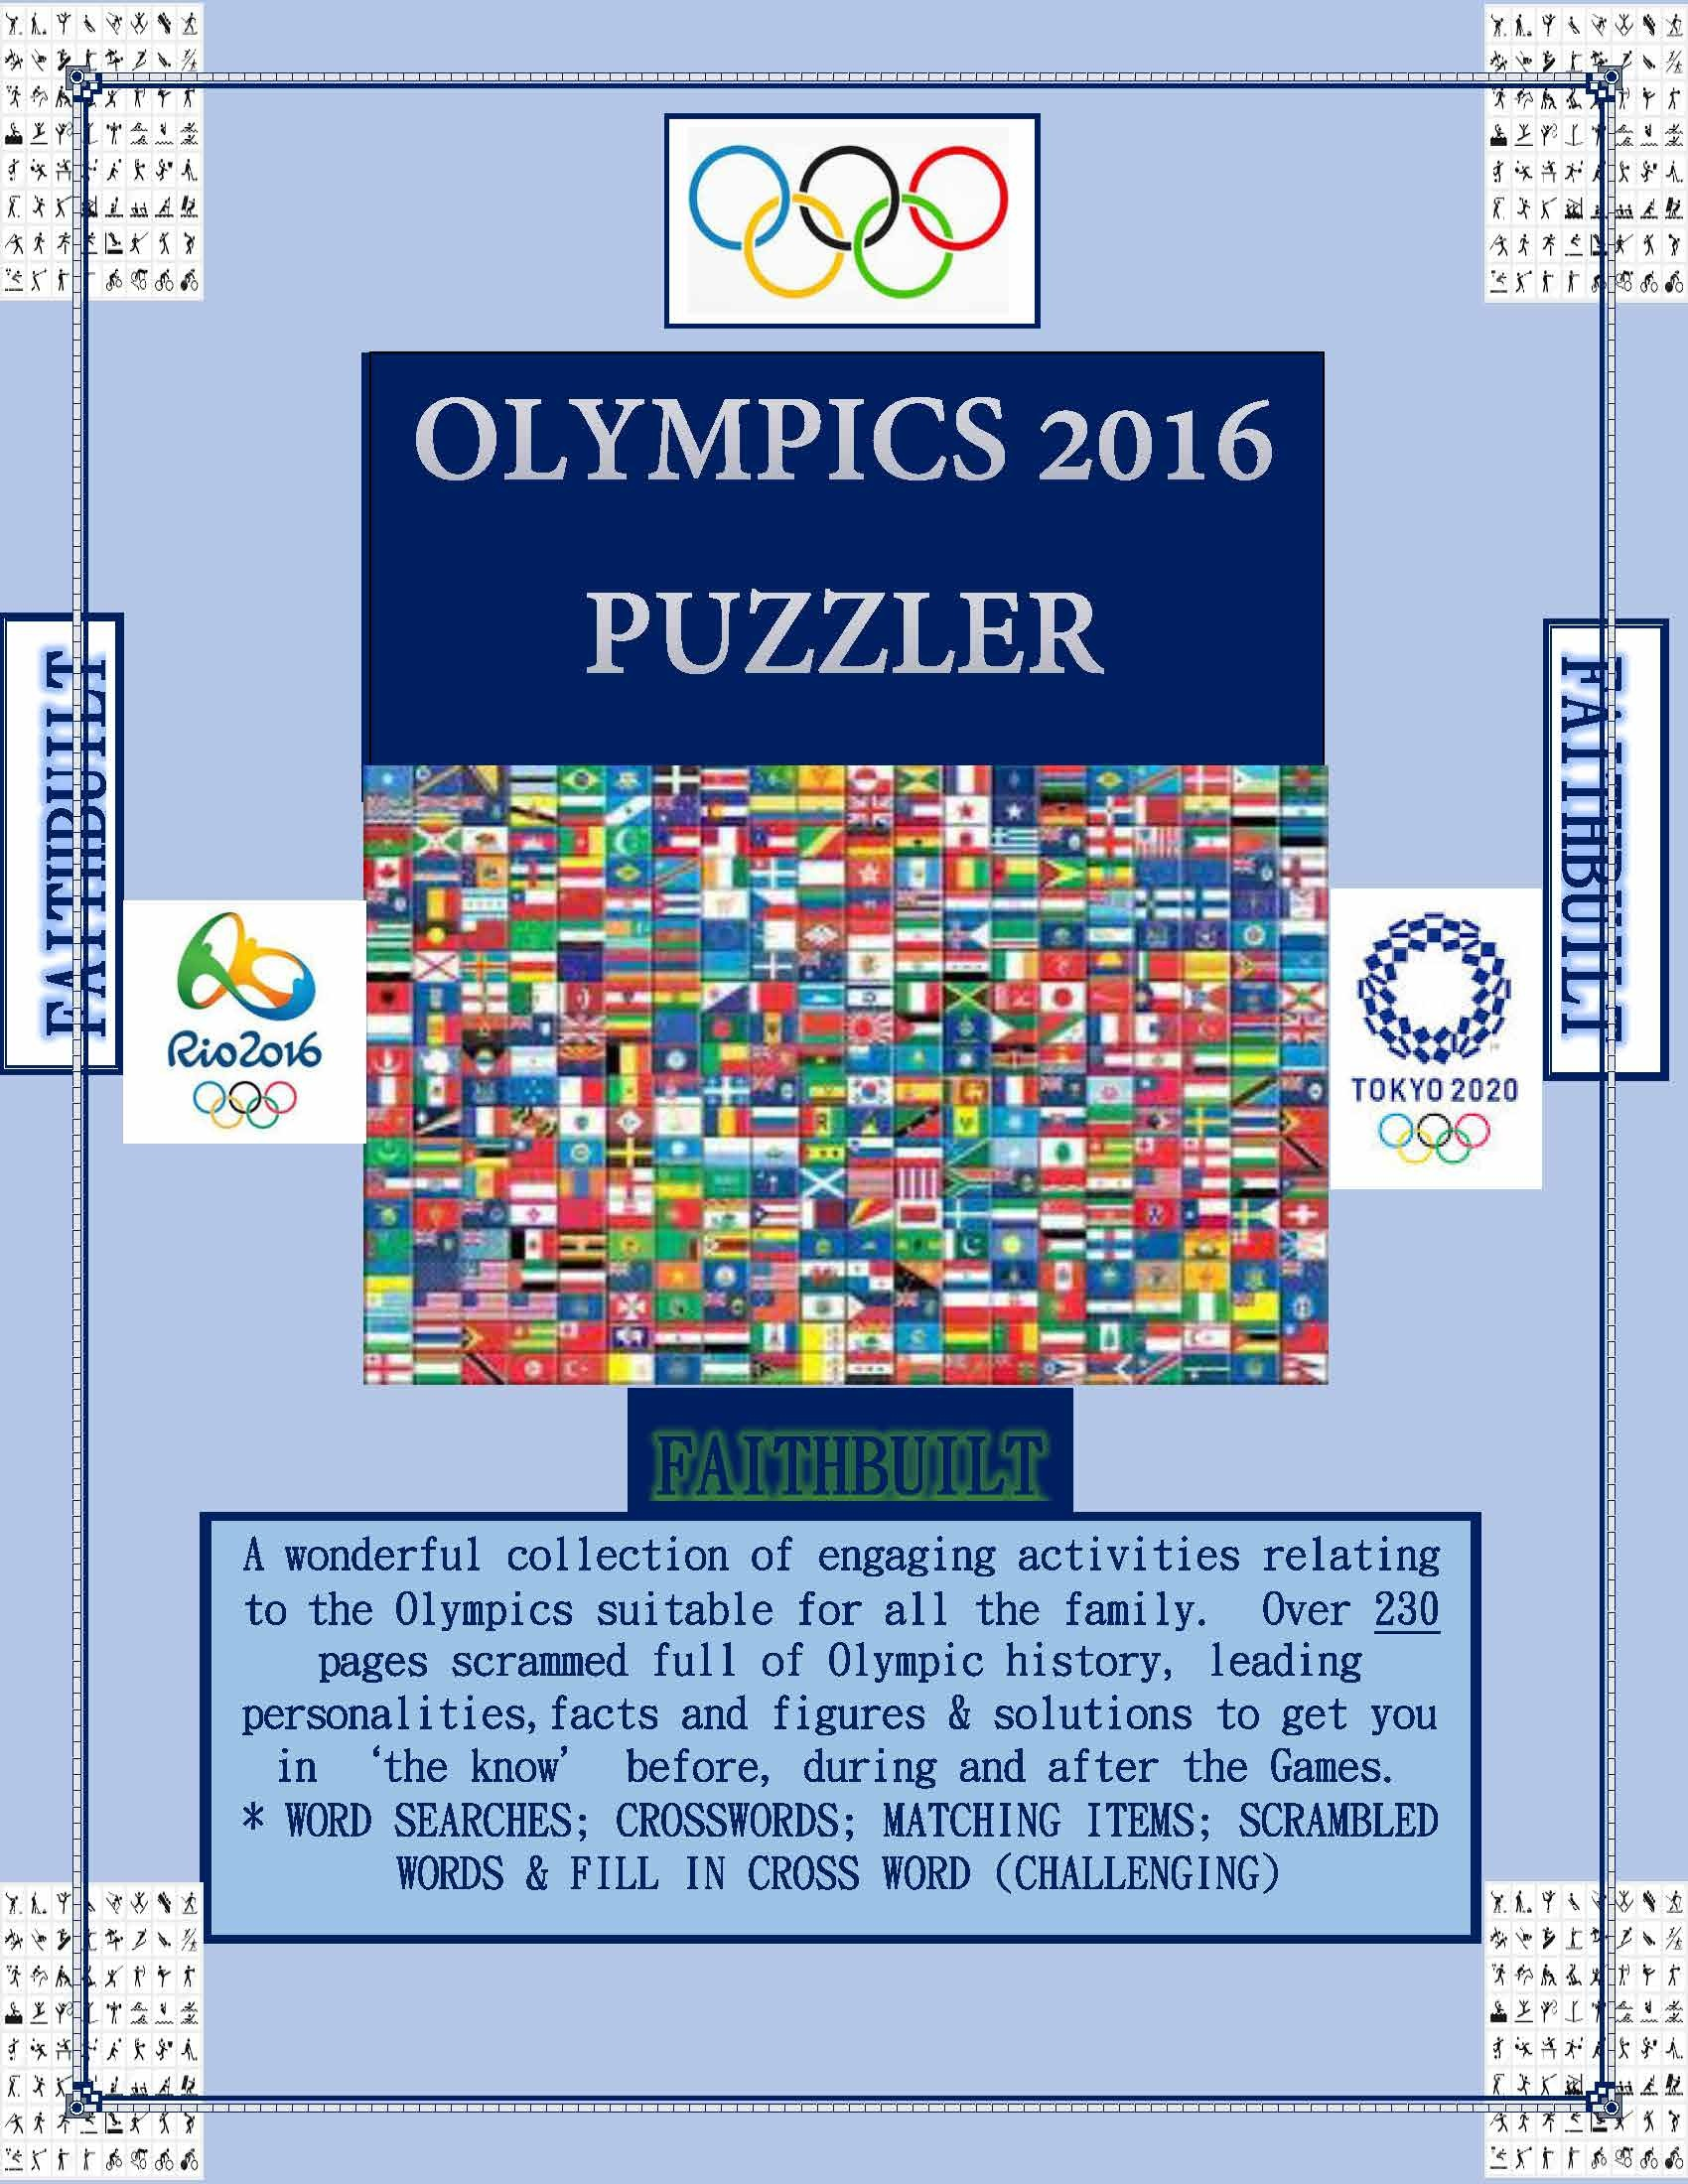 OLYMPICS PUZZLER 2016